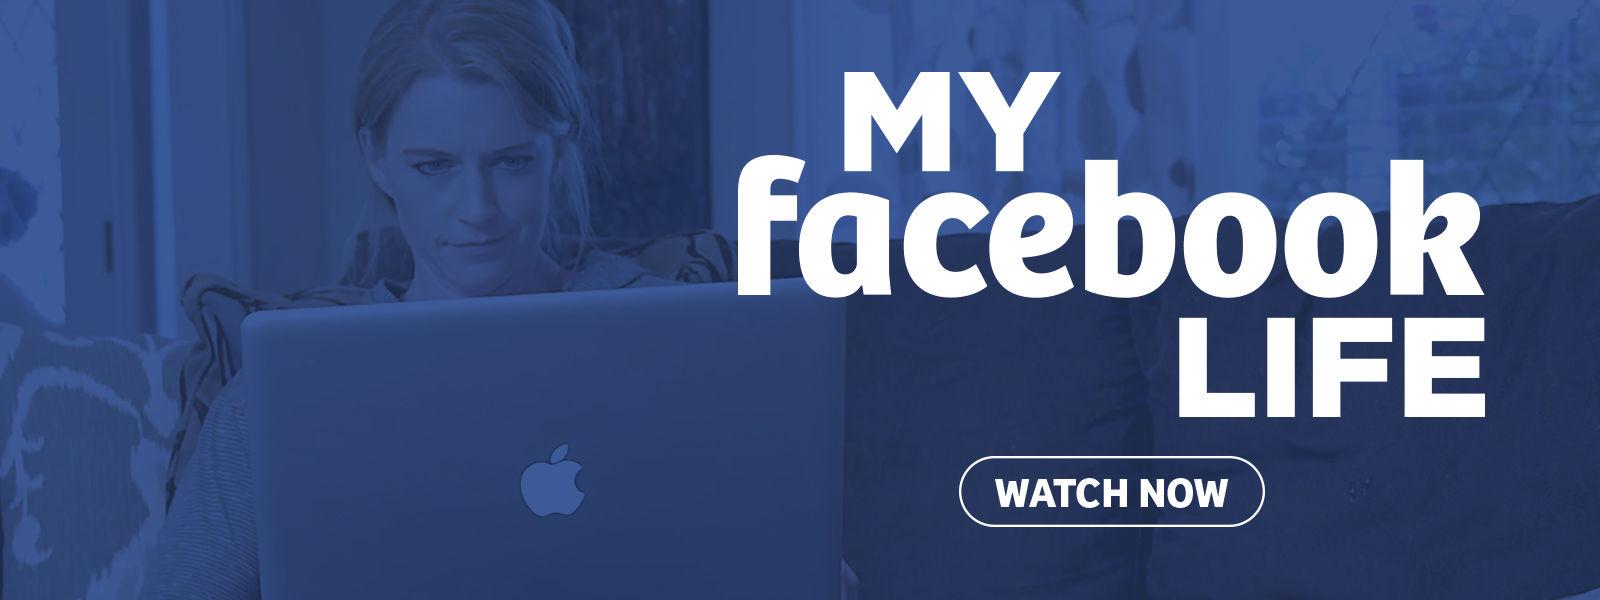 My Facebook Life